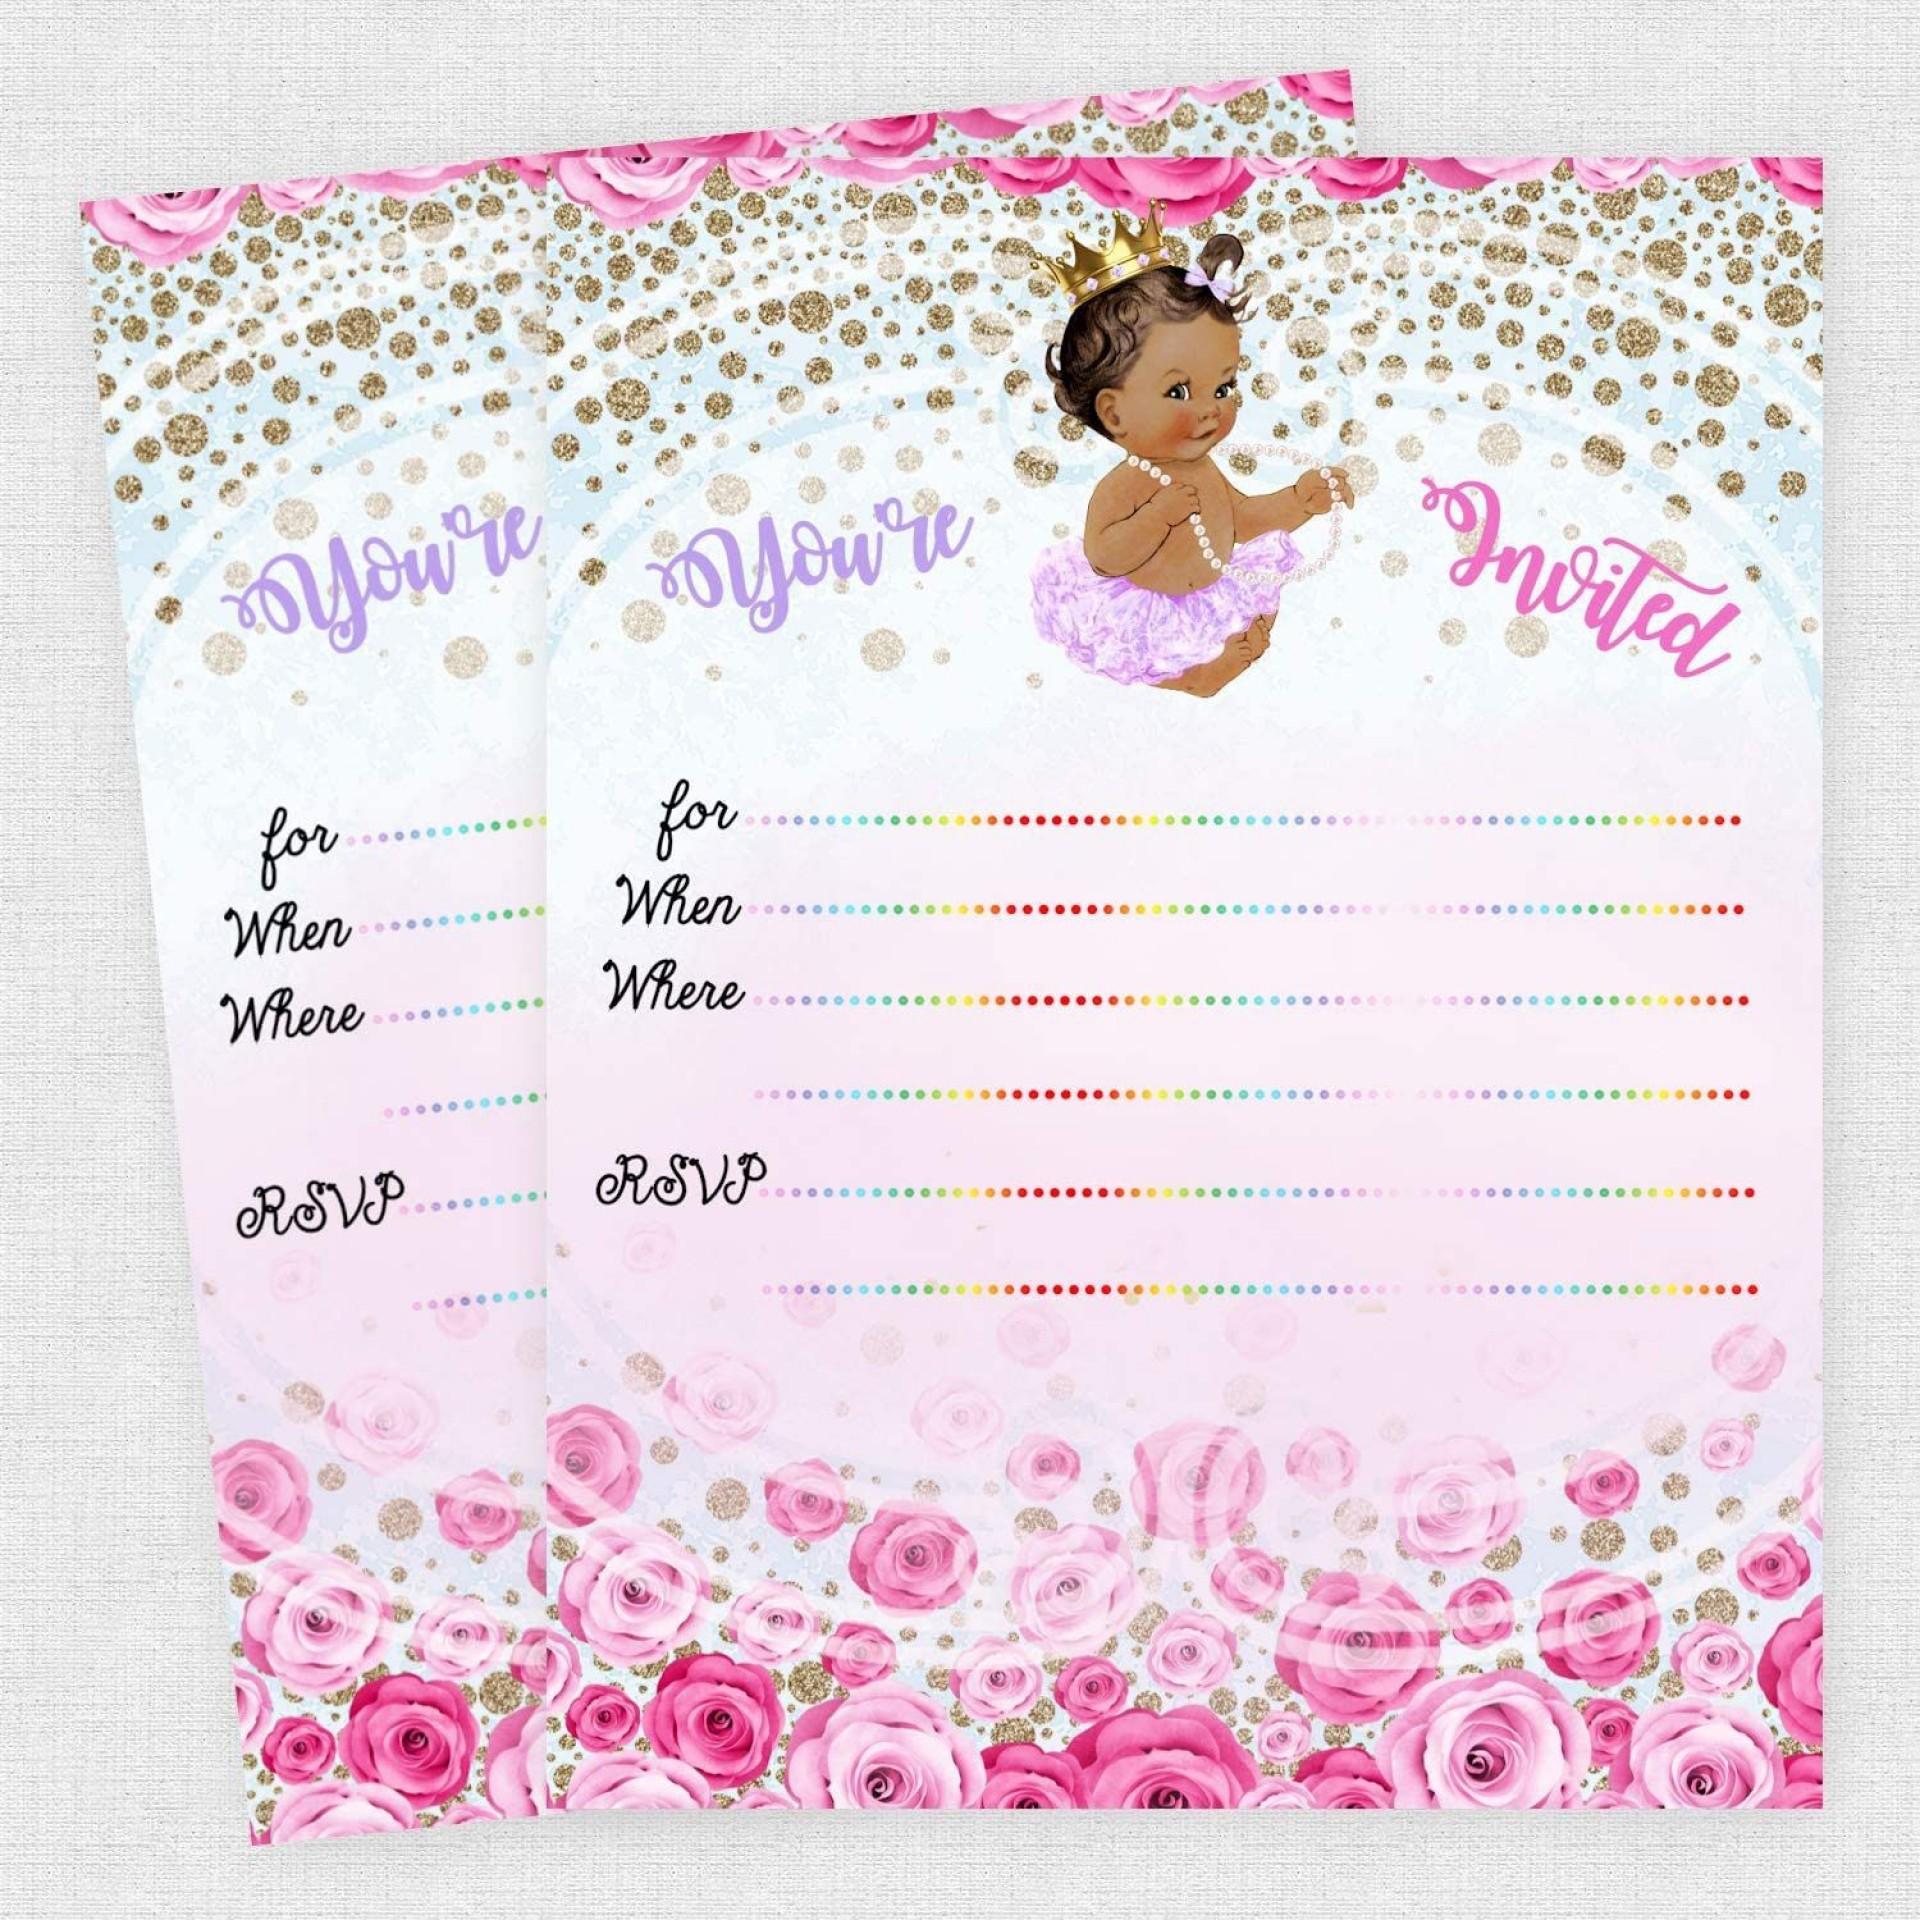 005 Amazing Baby Shower Invitation Girl Princes Image  Princess Theme1920